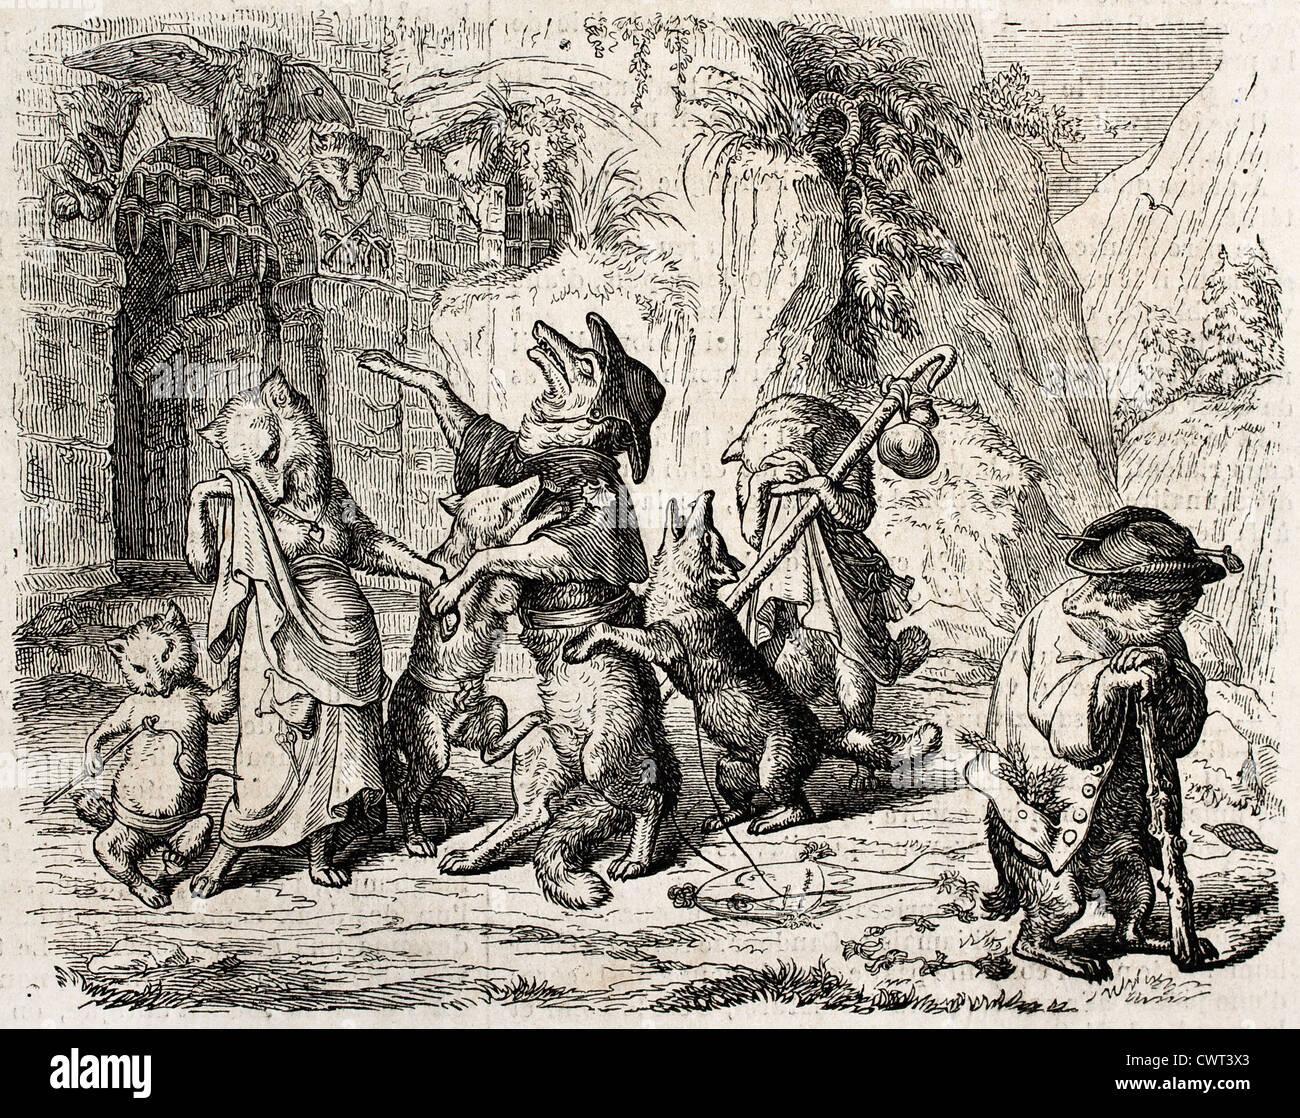 Alte Abbildung Reynecke Fuchs, Goethe Gedicht entnommen Stockbild